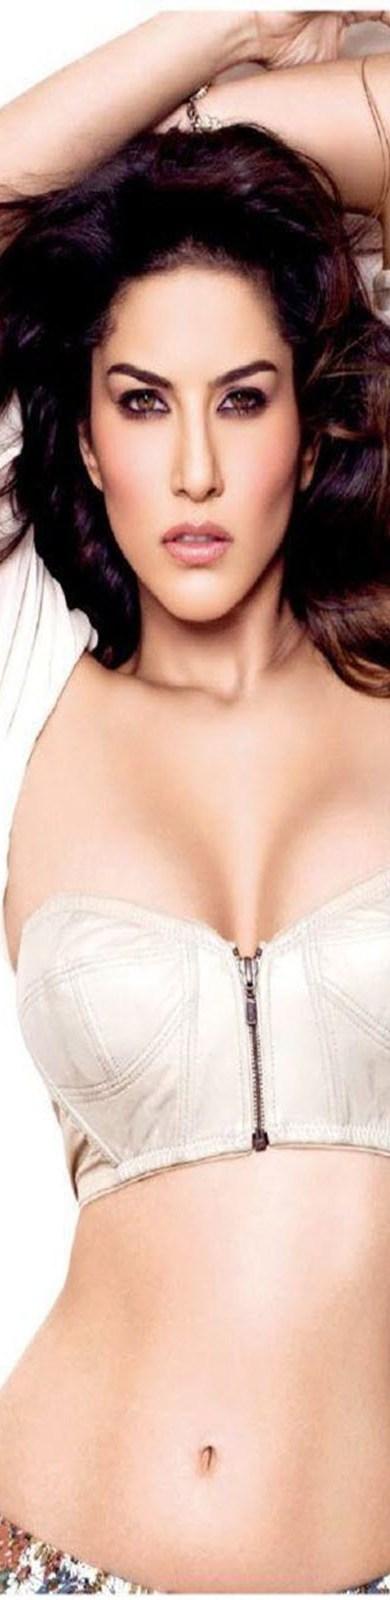 Sunny Leone Profile and Latest Pics Collection